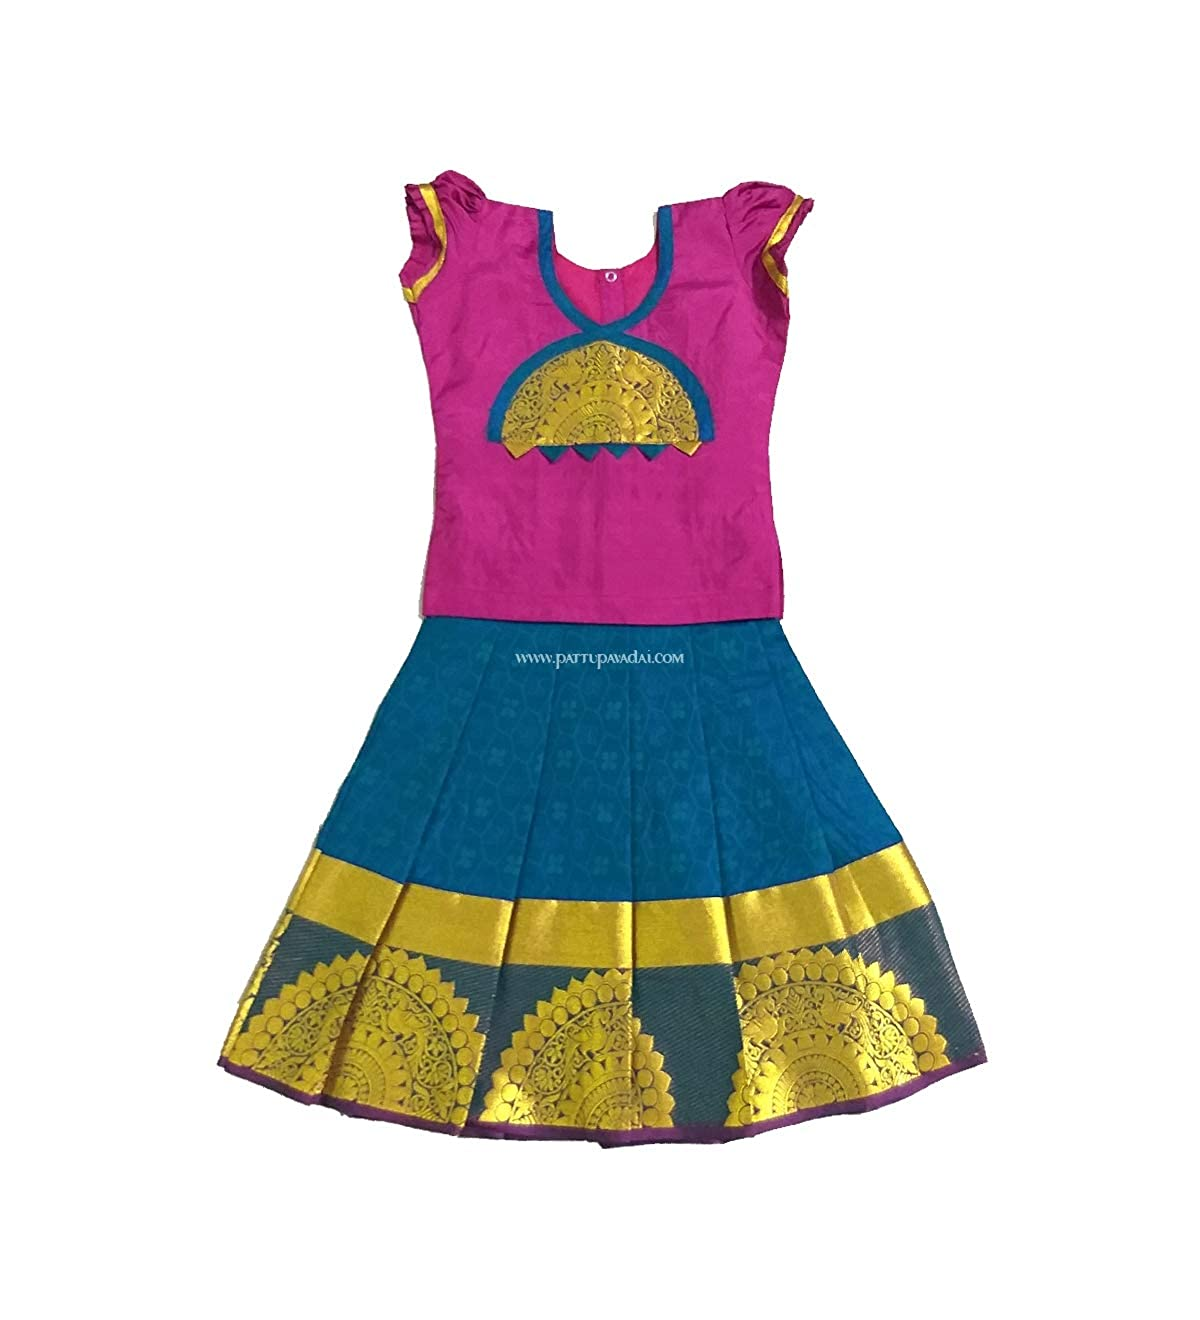 f4b41c6671e27 Pattu pavadai soft silk pavada peacock blue and pink for baby girls kids  clothing jpg 1200x1320